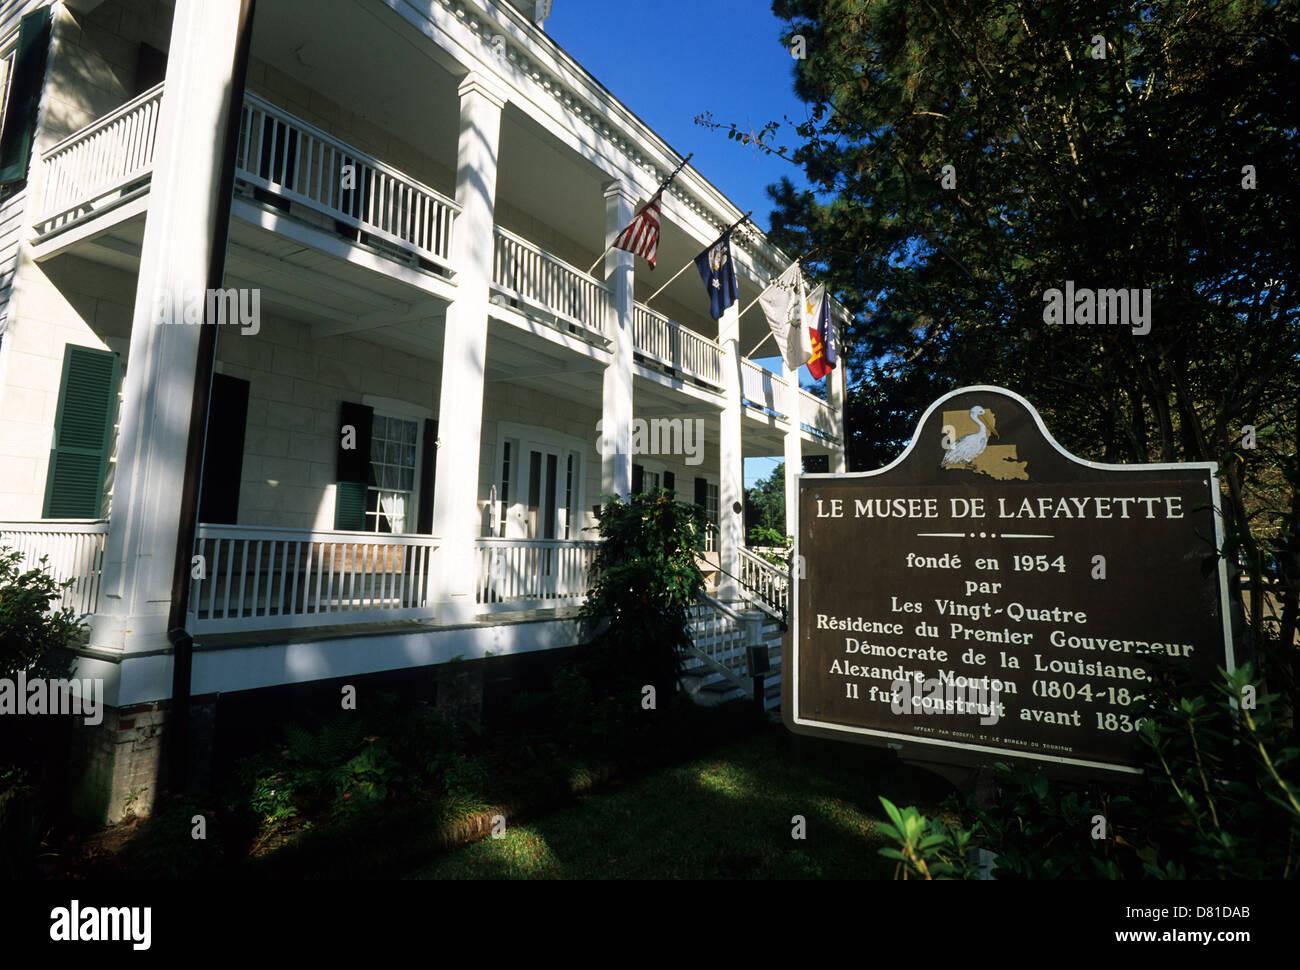 Elk283-3515 Louisiana, Cajun Country, Lafayette, Alexandre Mouton House Museum, 1836 - Stock Image